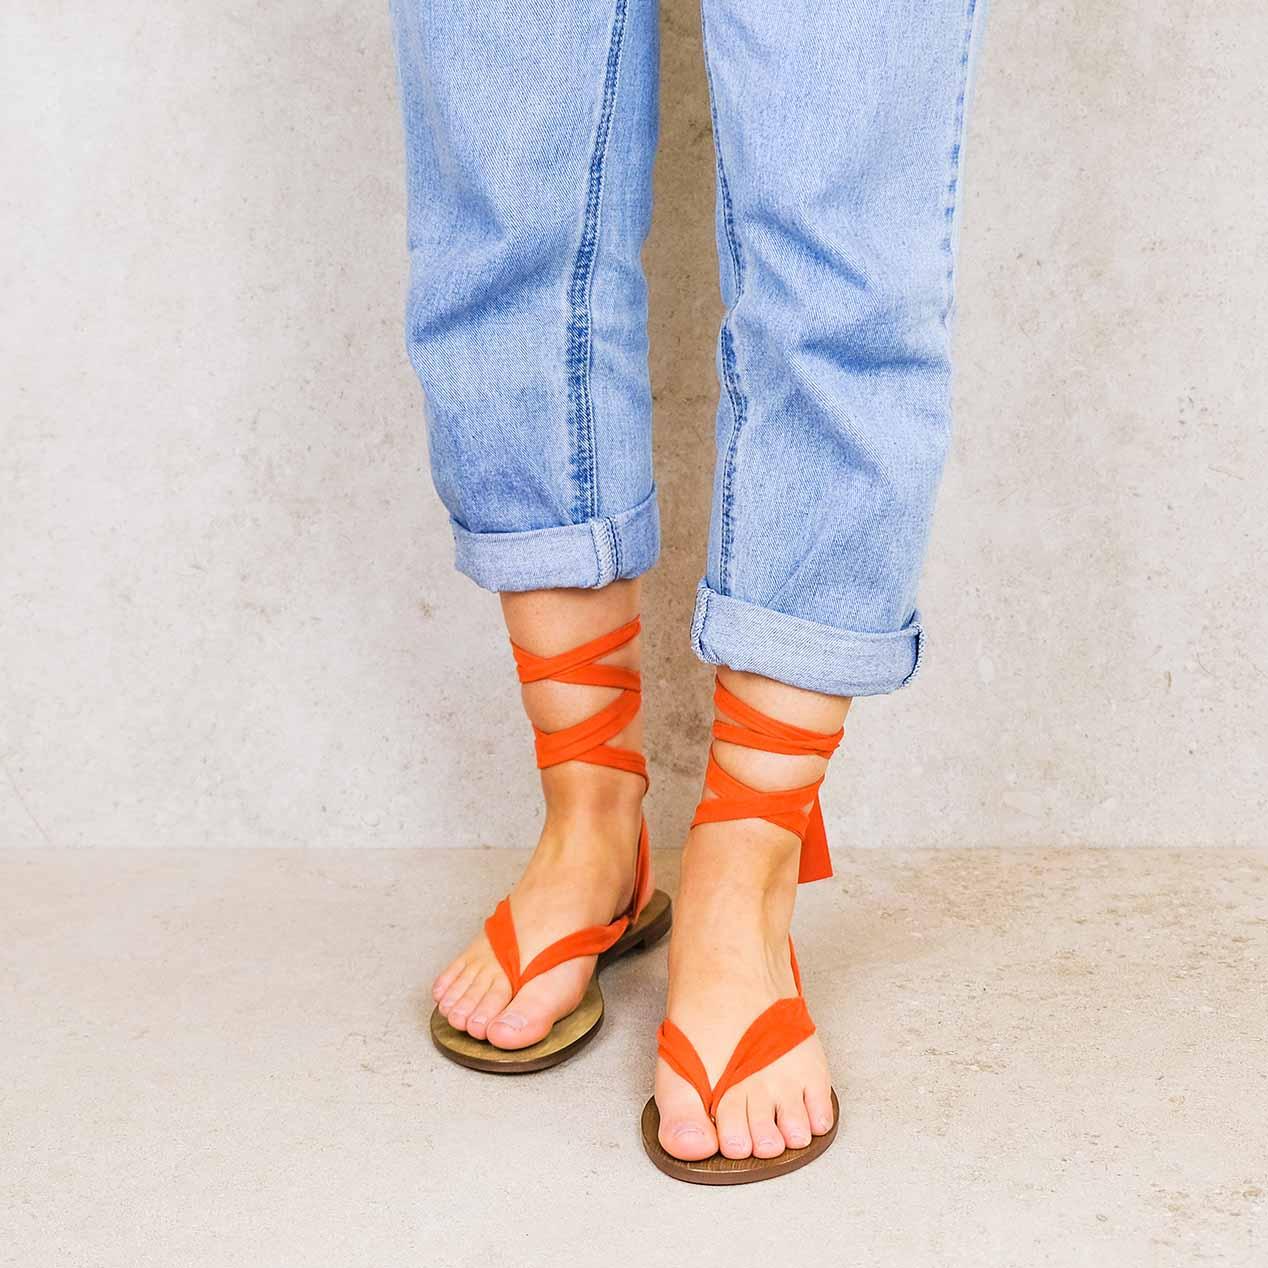 Raramuri-orange_suede ribbons linten lintsandalen sandals travelsandals vegan sustainable sandals wikkelsandalen